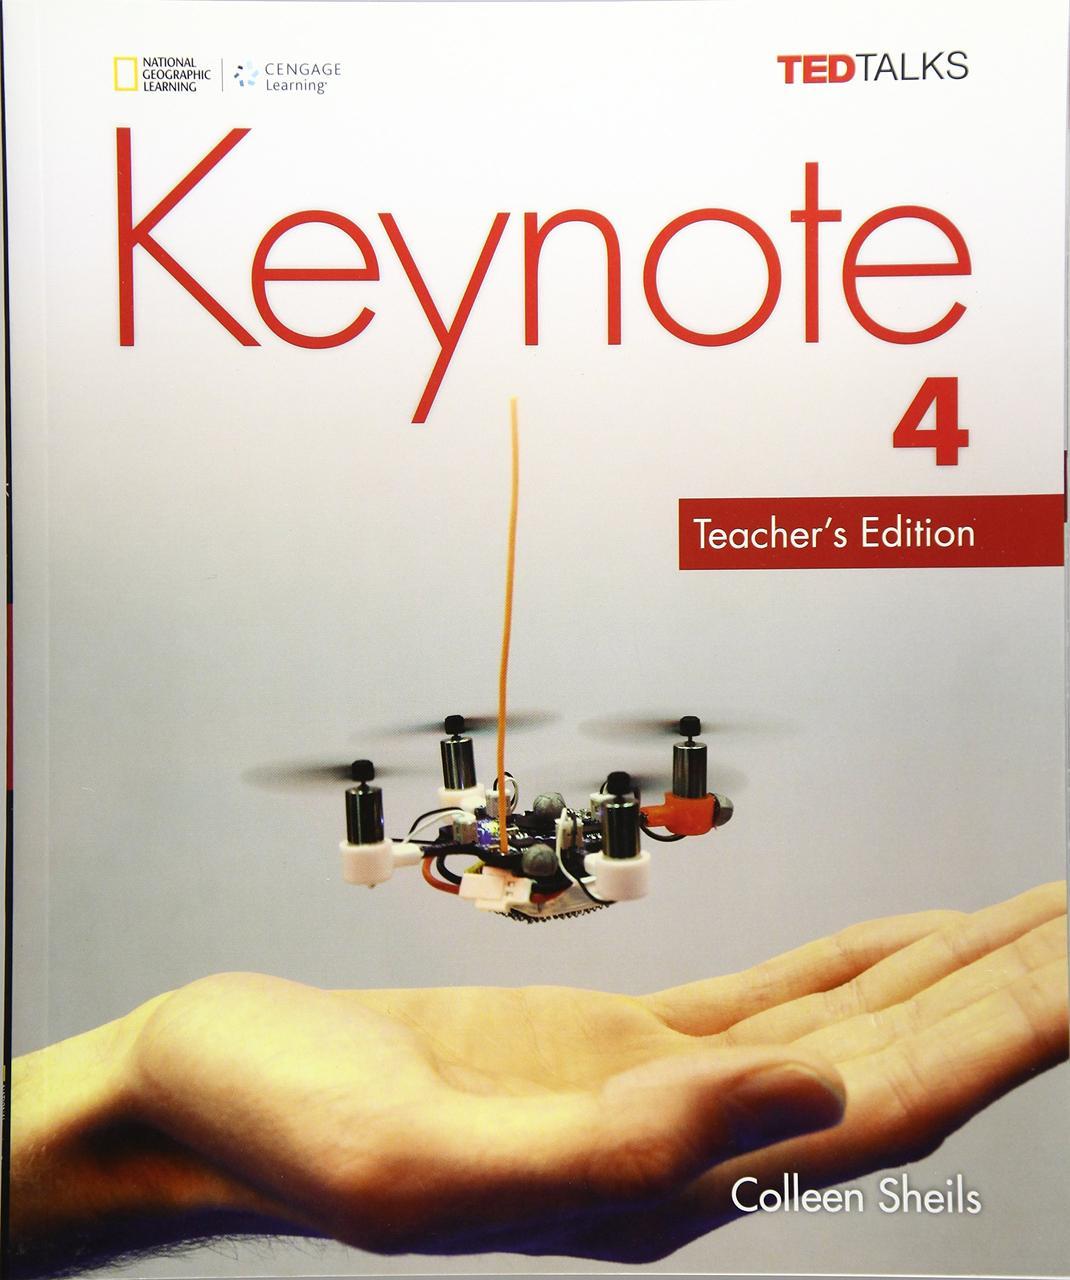 American Keynote 4 Teacher's Edition